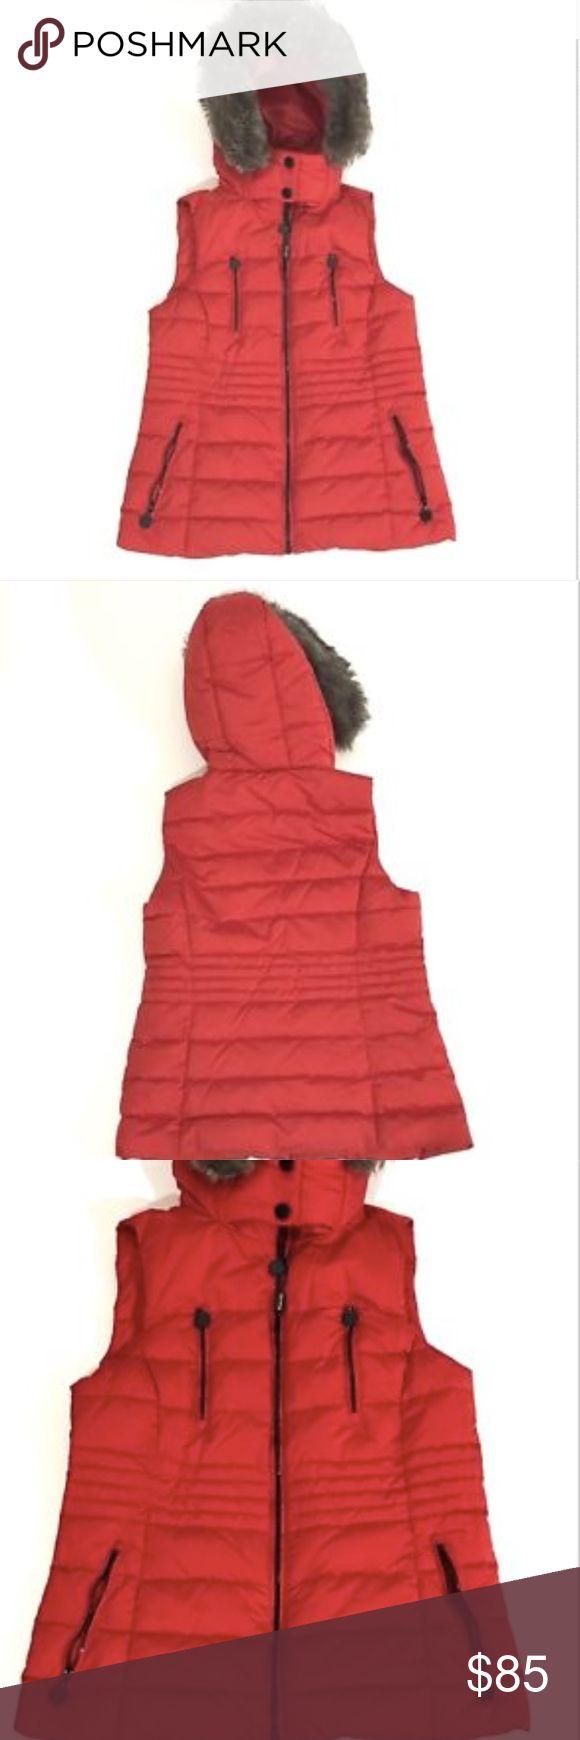 "Massimo Dutti Puffer Vest Sheephair Fur Hood Bust 18 1/2"" Length 25 1/2"" Maasimo Dutti Jackets & Coats Vests"